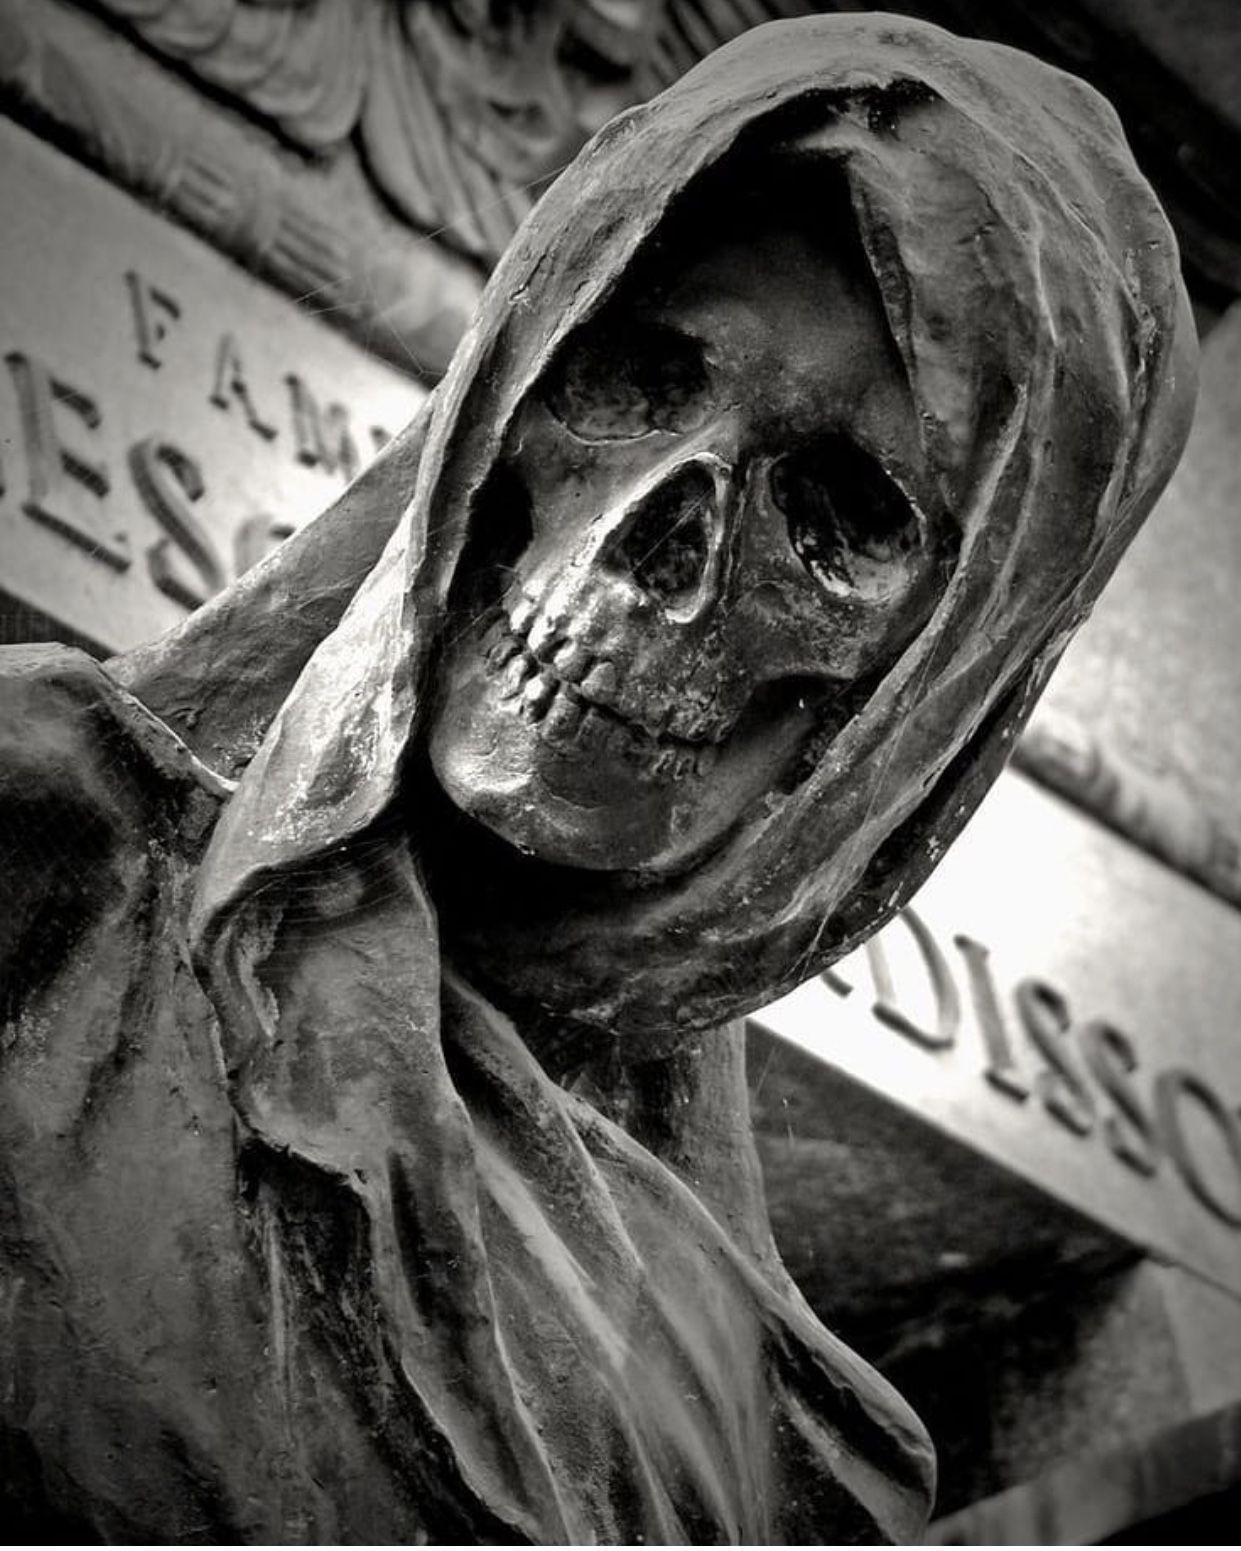 Pin by Derald Hallem on Skull art in 2019 | Cemetery ...